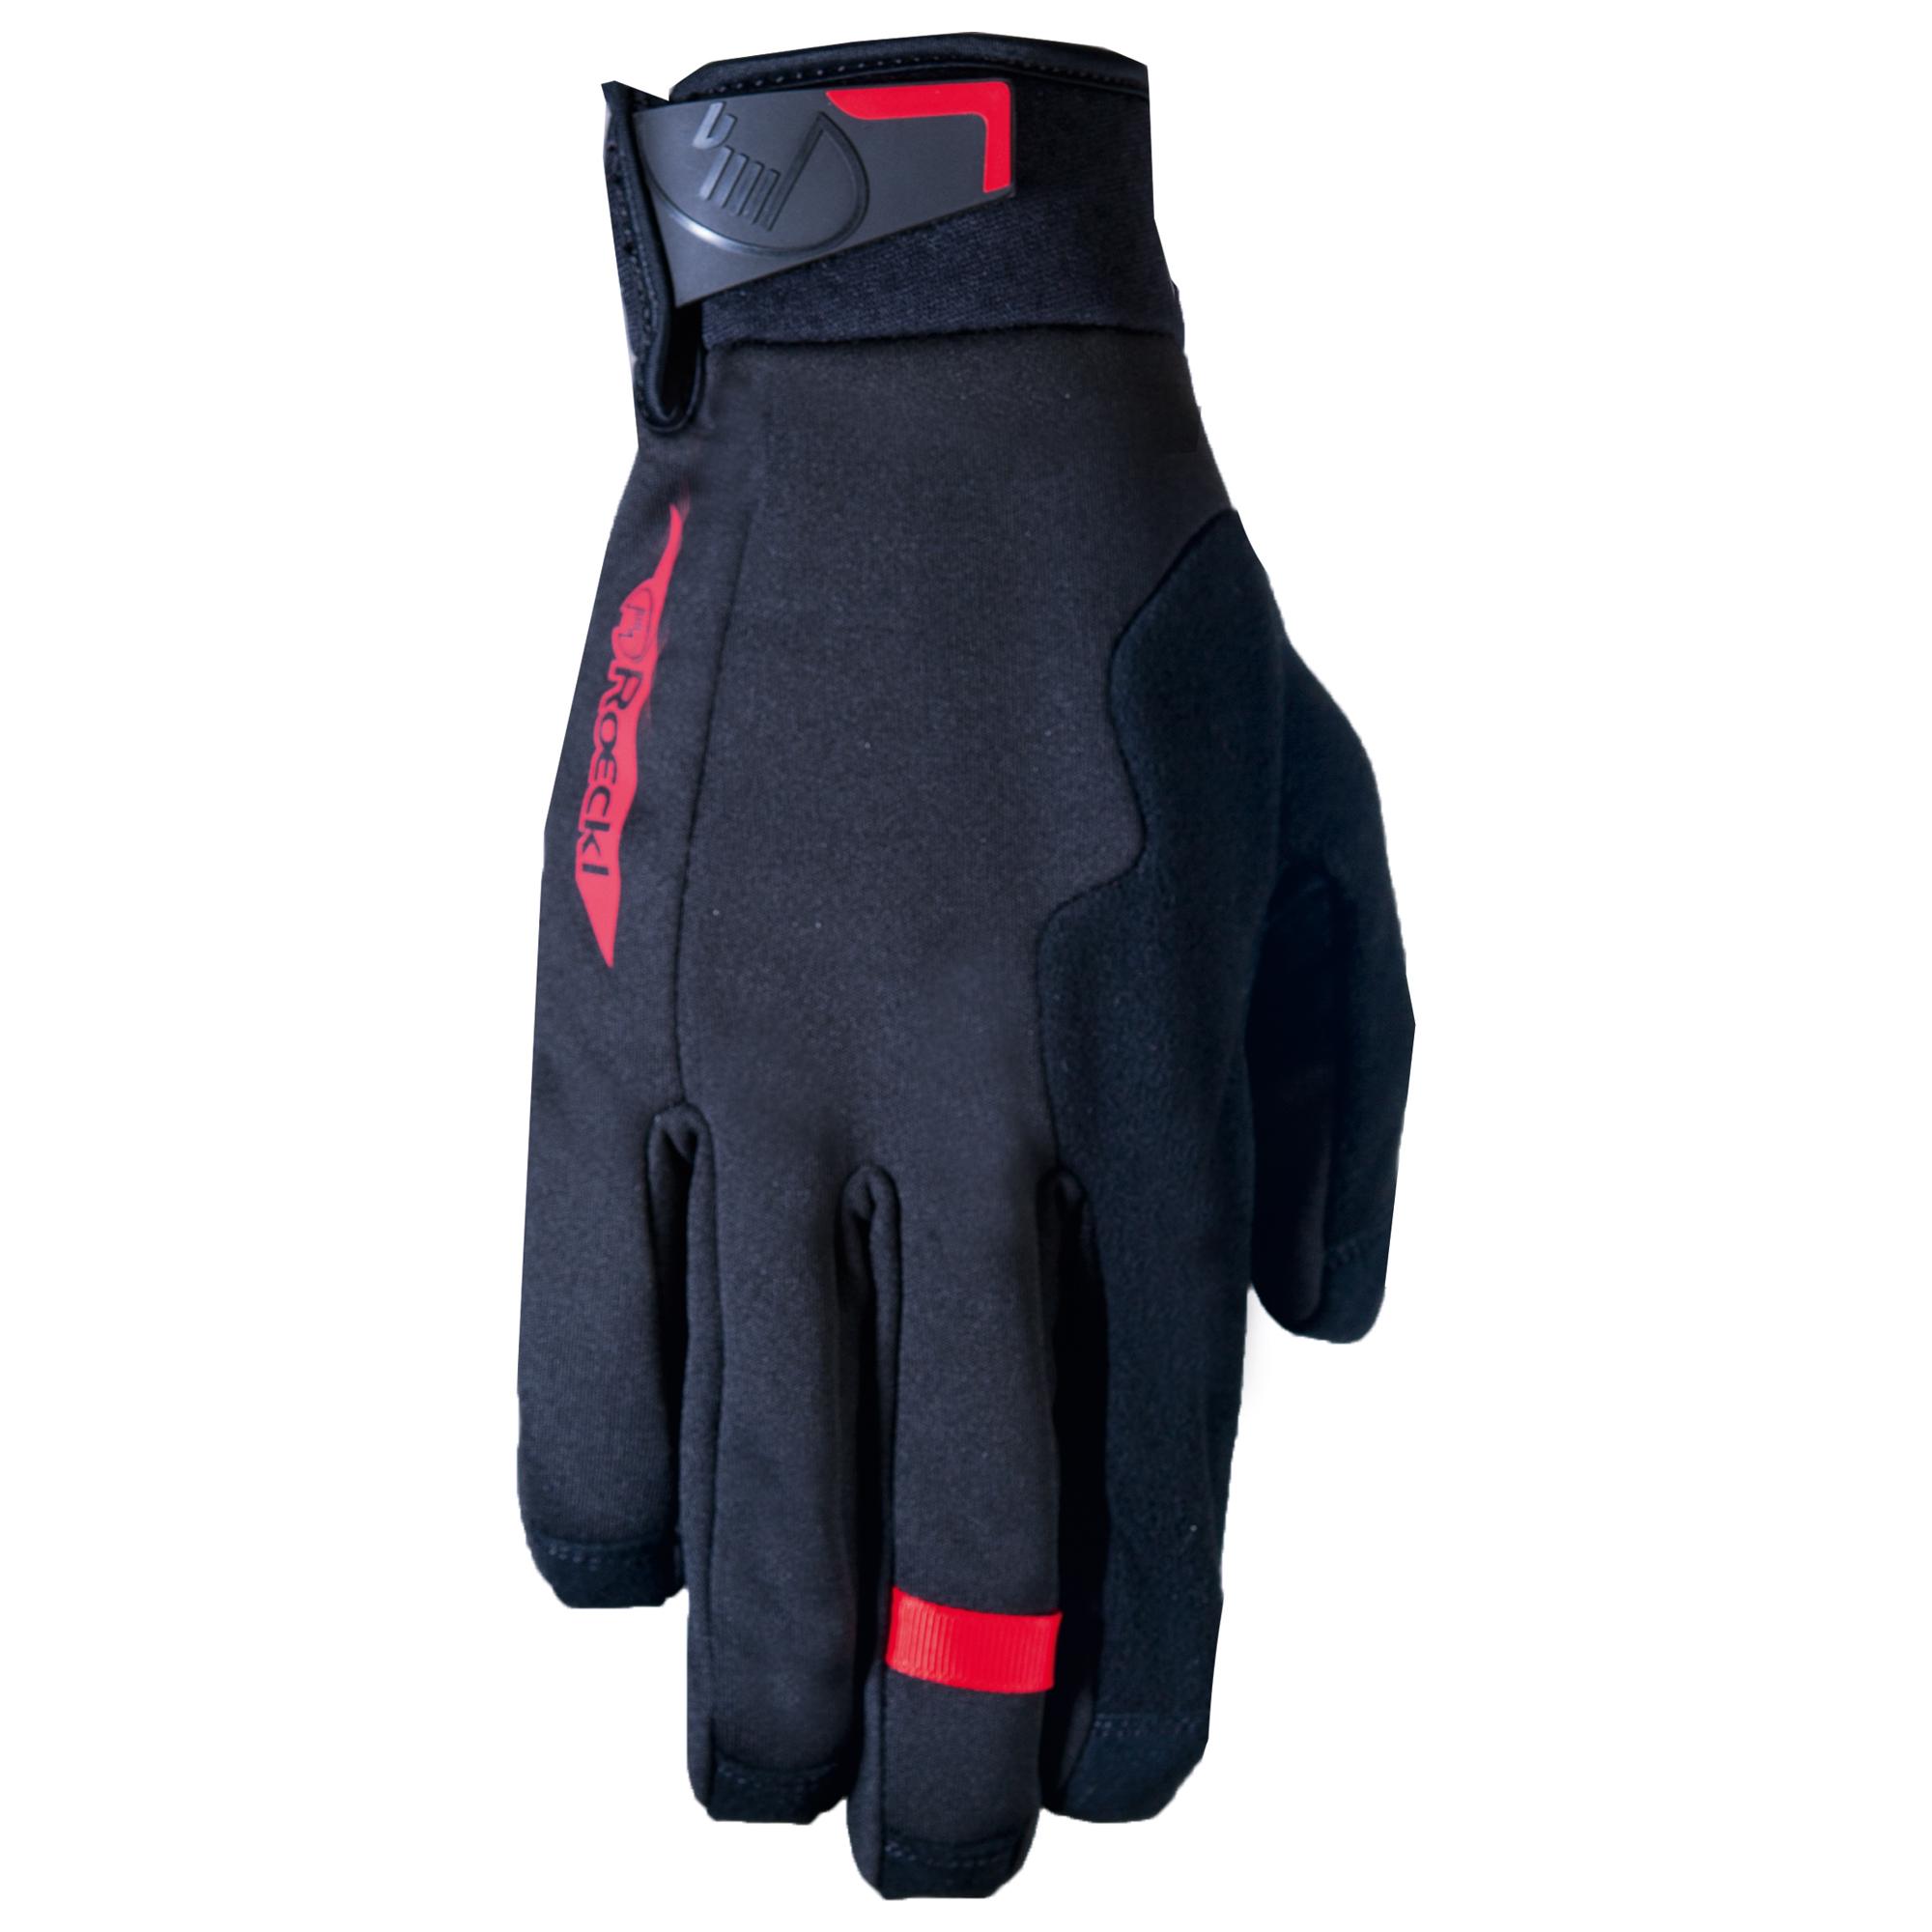 Roeckl Handschuhe Kabingo schwarz